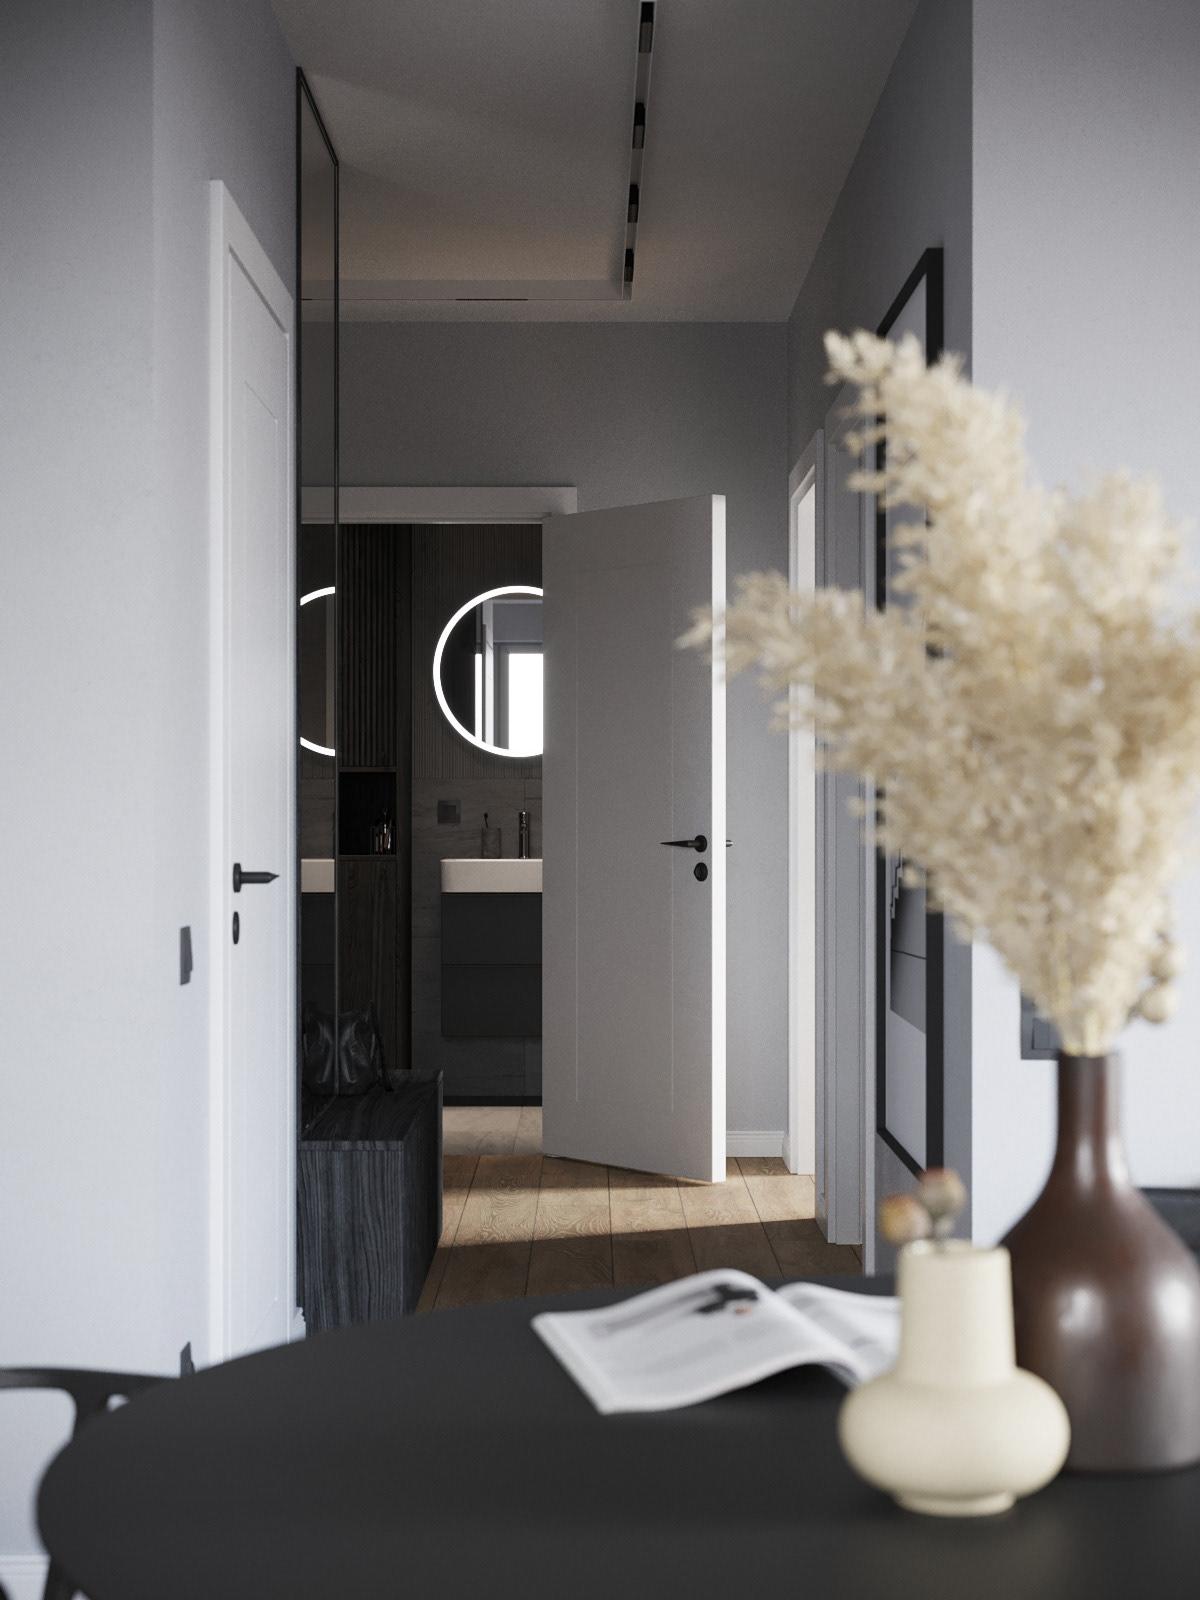 3danimation animation  apartments CGI exterior Interior